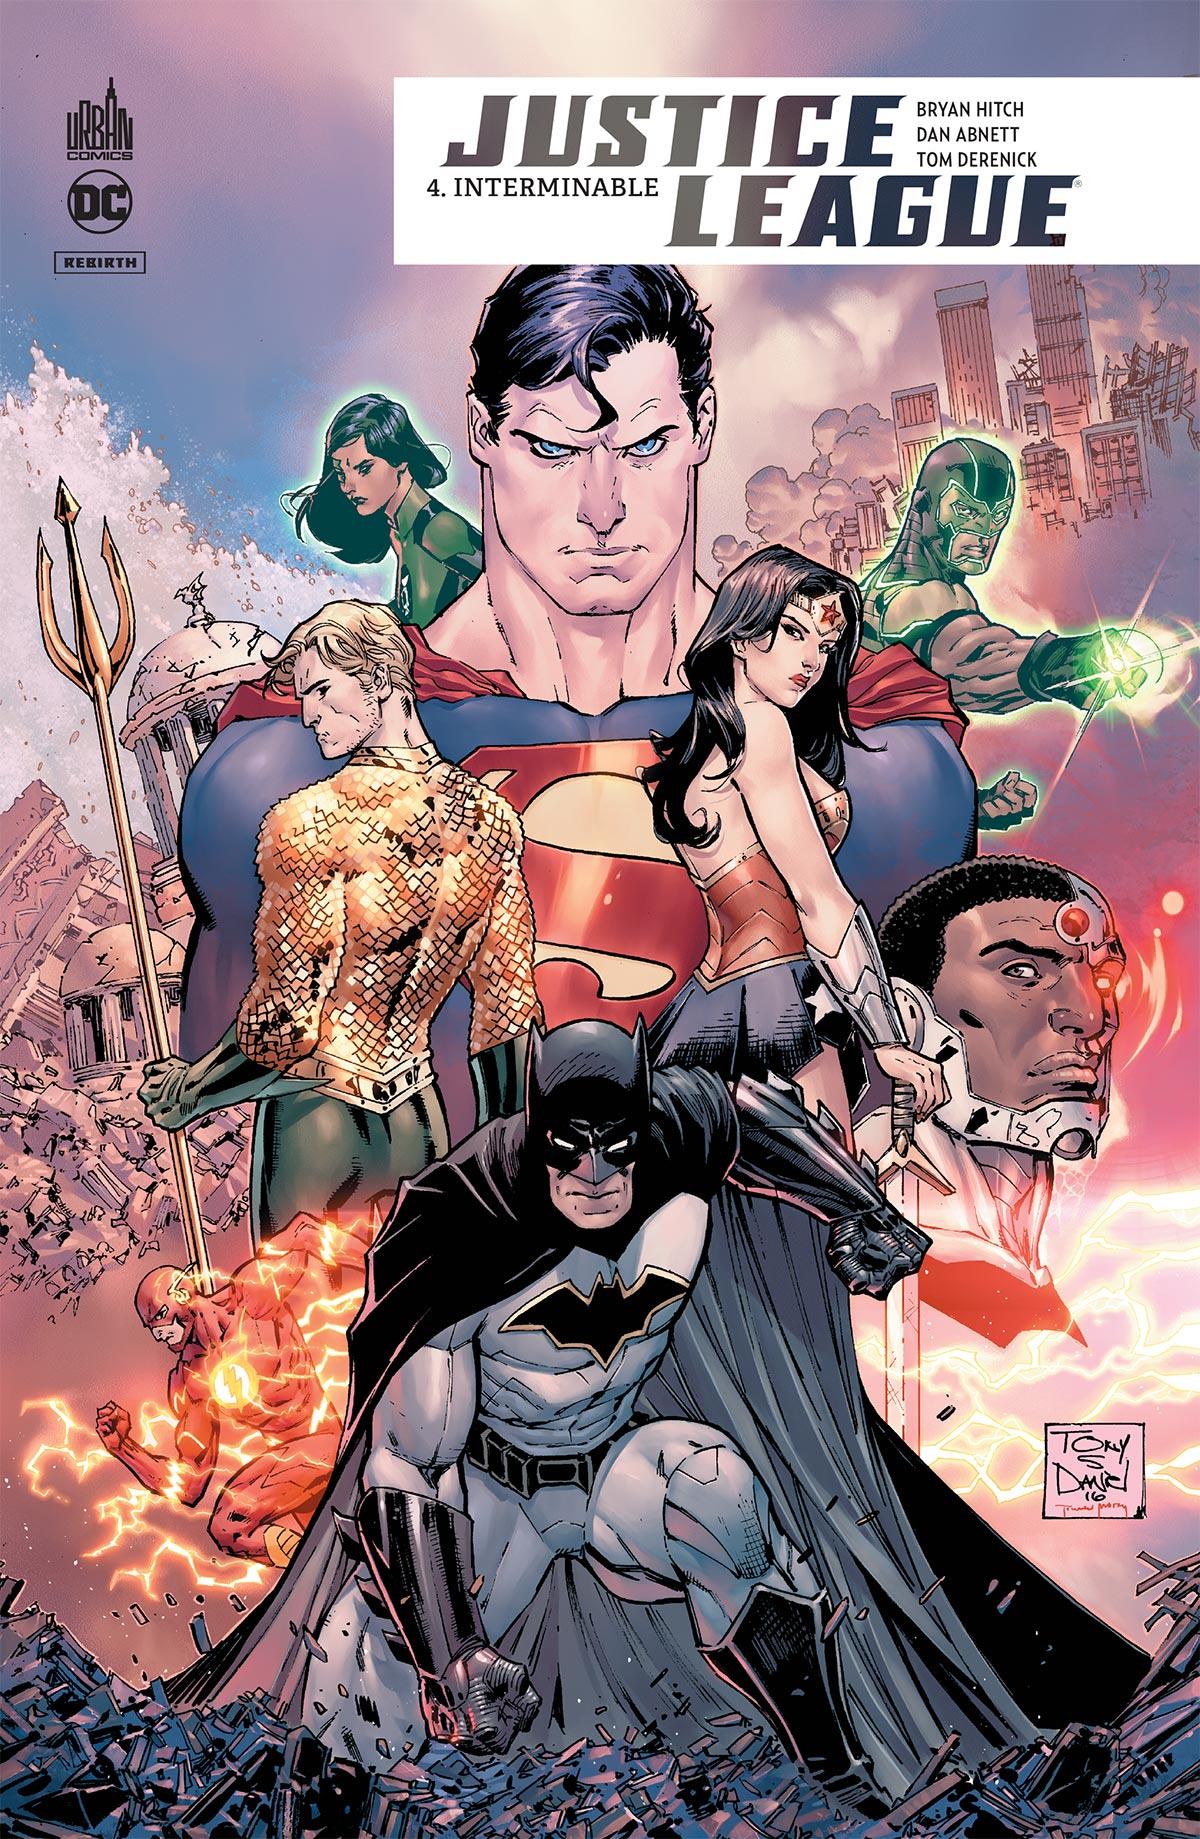 Justice League Rebirth 4 - Interminable